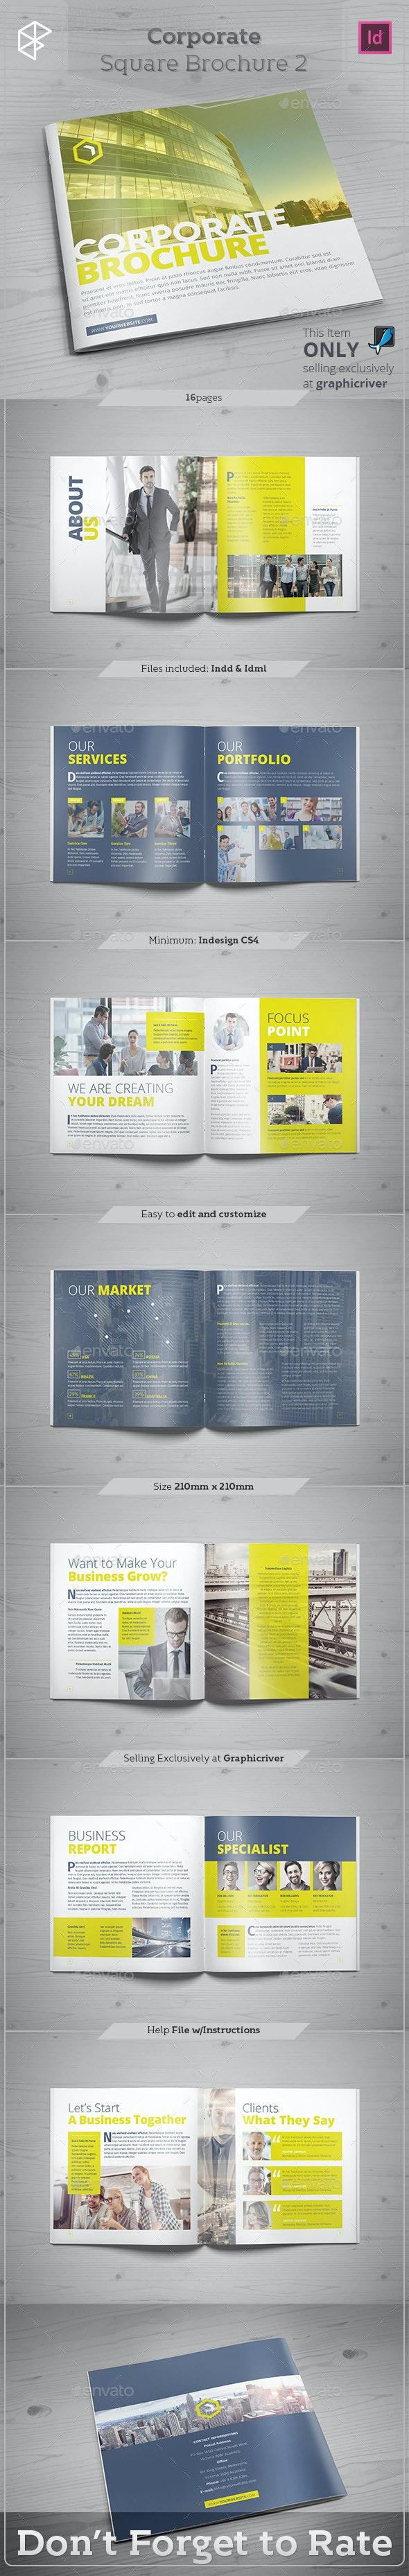 Corporate Square Brochure 2 - Corporate Brochures